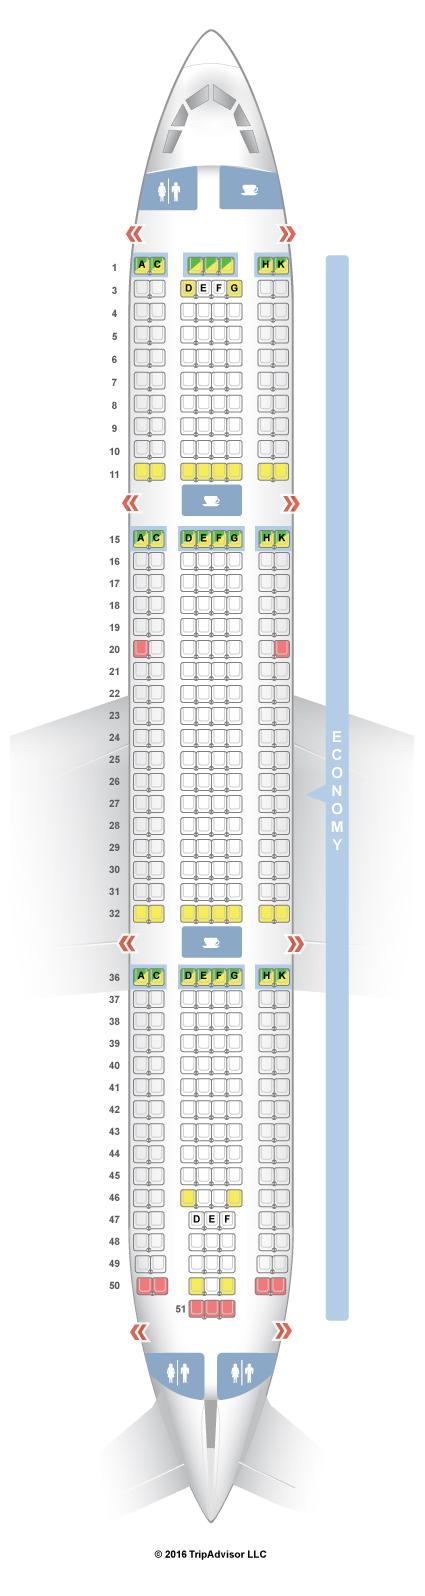 SeatGuru Seat Map WOW air on seatguru boeing 788 seat map, pan am seat map, privatair seat map, bulgarian air seat map, dragonair seat map, gulf air seat map, aircraft 76w seat map, air macau seat map, atlas air seat map, iran air seat map, saudia seat map, air tahiti seat map, xl airways france seat map, easyjet seat map, airline seat map, red wings seat map, first air seat map, air asia seat map, airberlin seat map, air india 777-300er seat map,